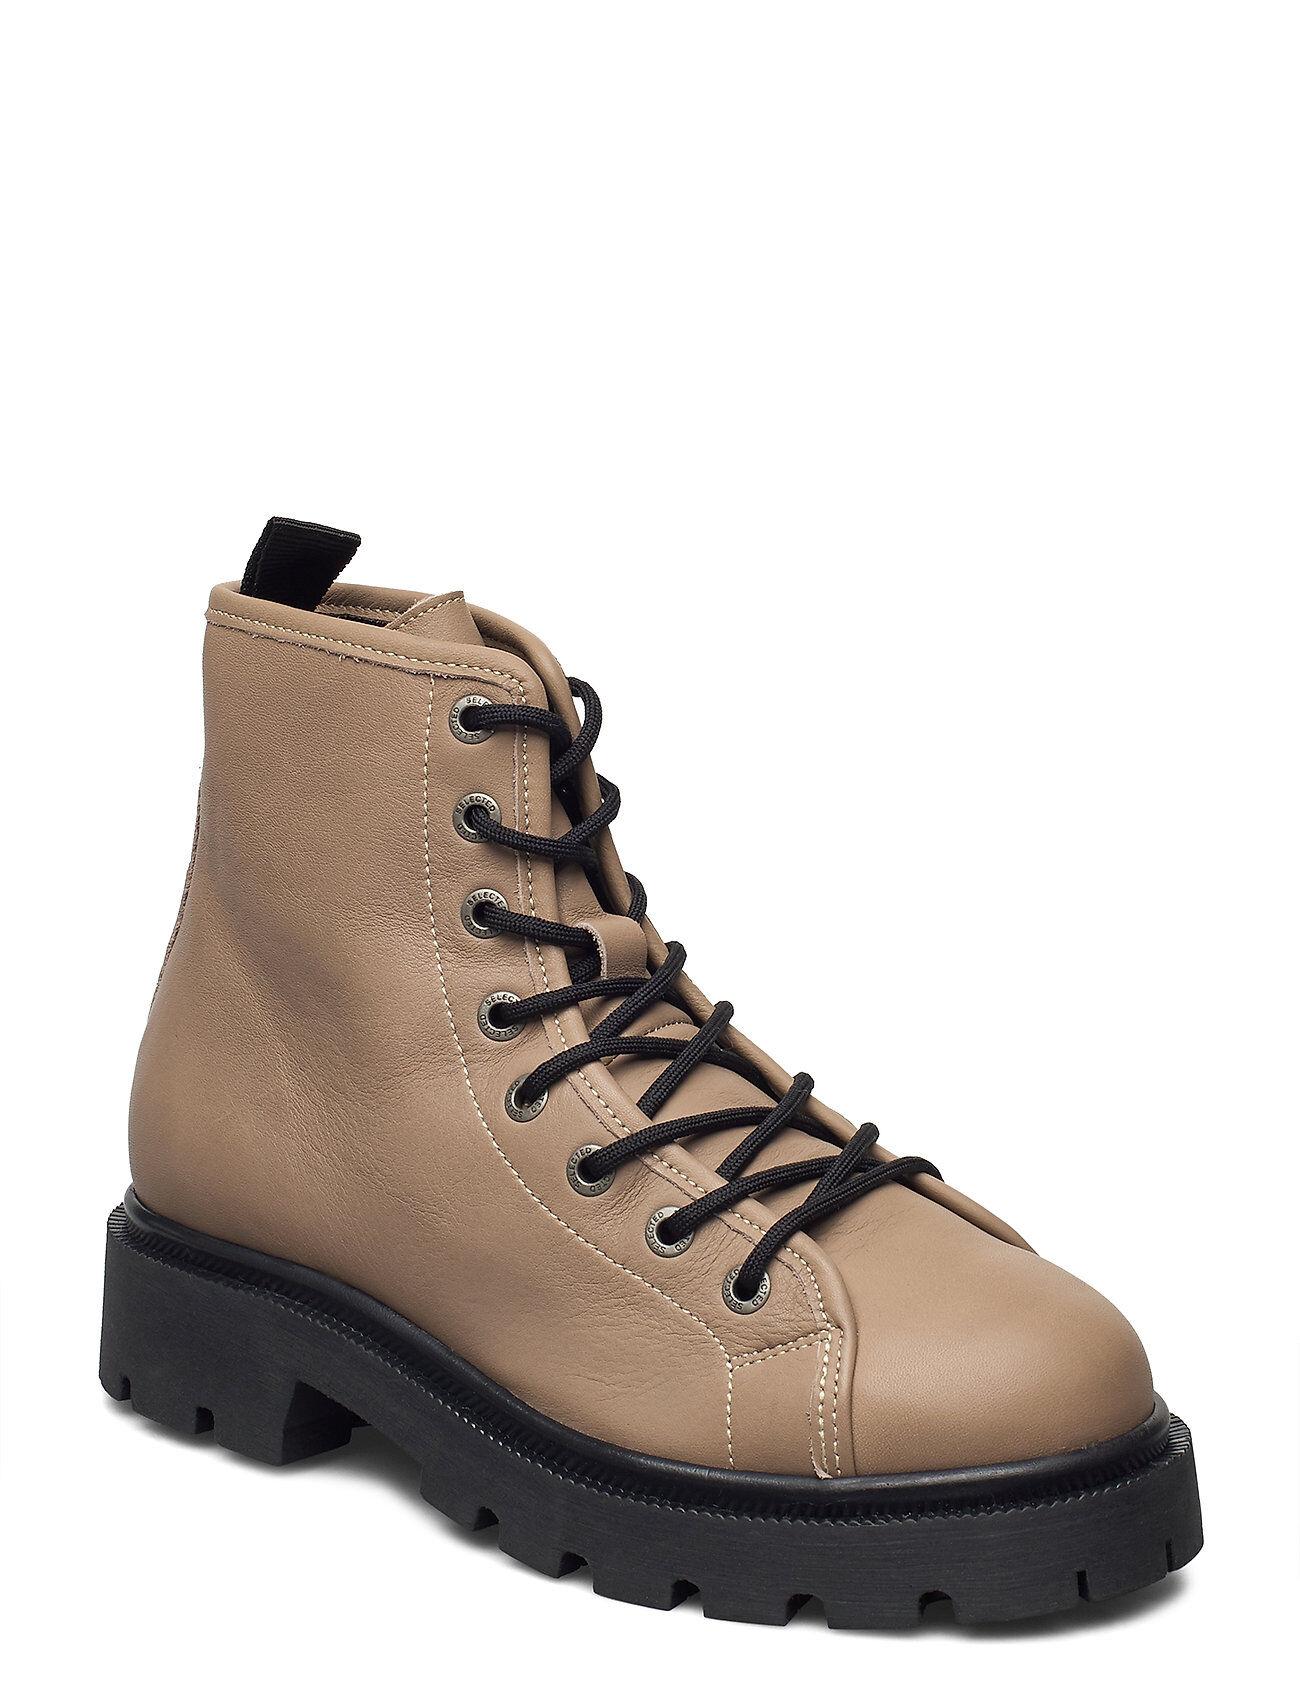 Selected Femme Slfemma Laceup Leather Boot B Nauhakengät Matalapohjaiset Kengät Ruskea Selected Femme